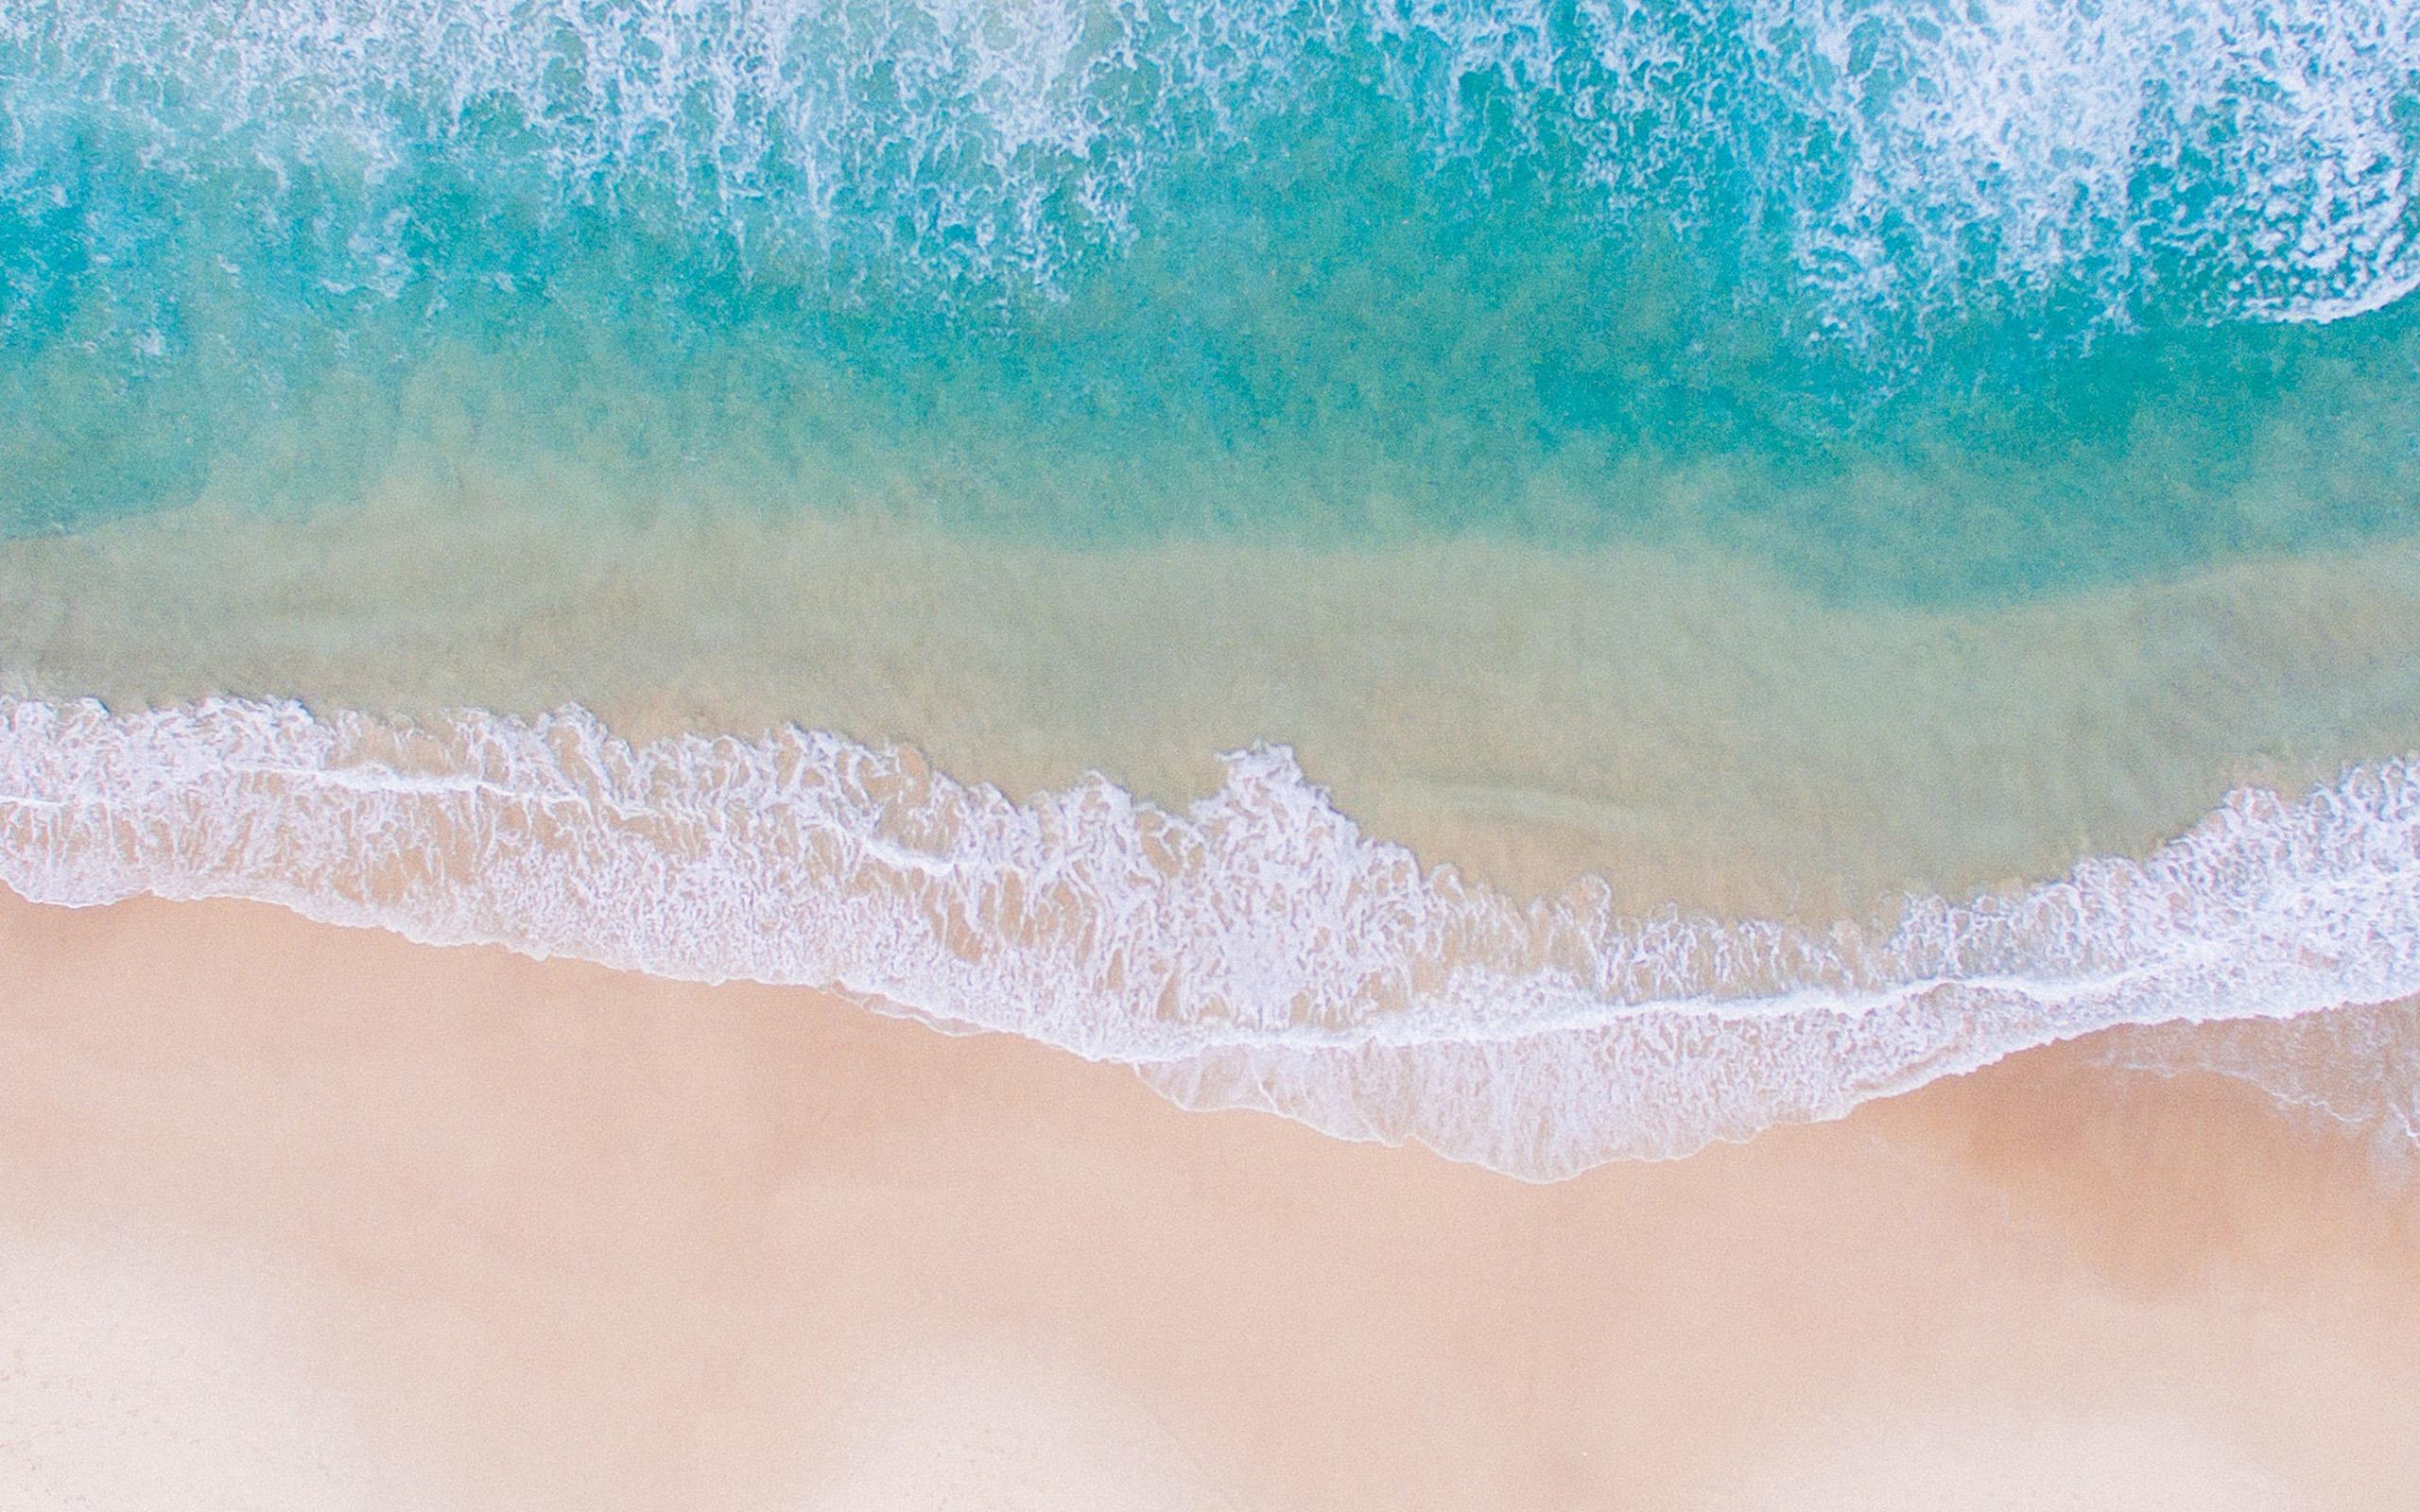 Nv20 Sea Beach Water Summer Nature Earth Wallpaper